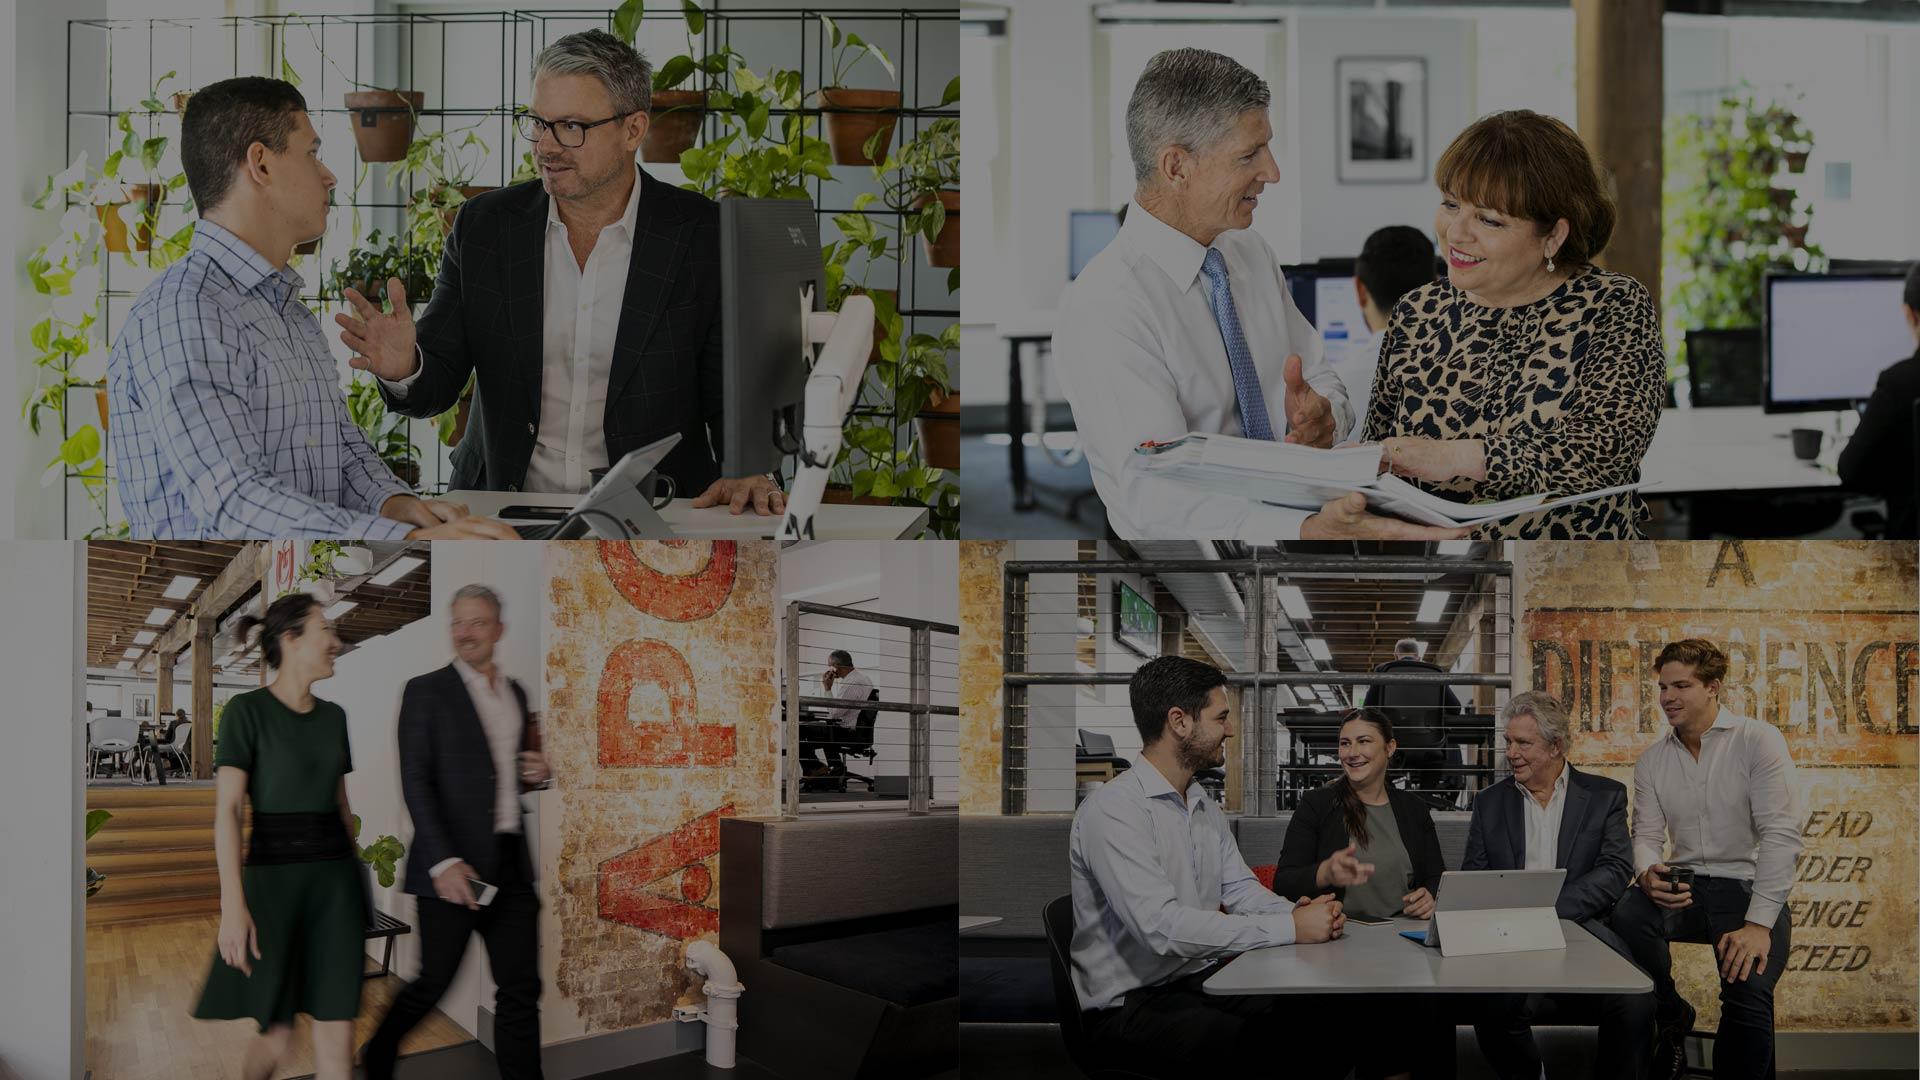 About Artazan Property Group